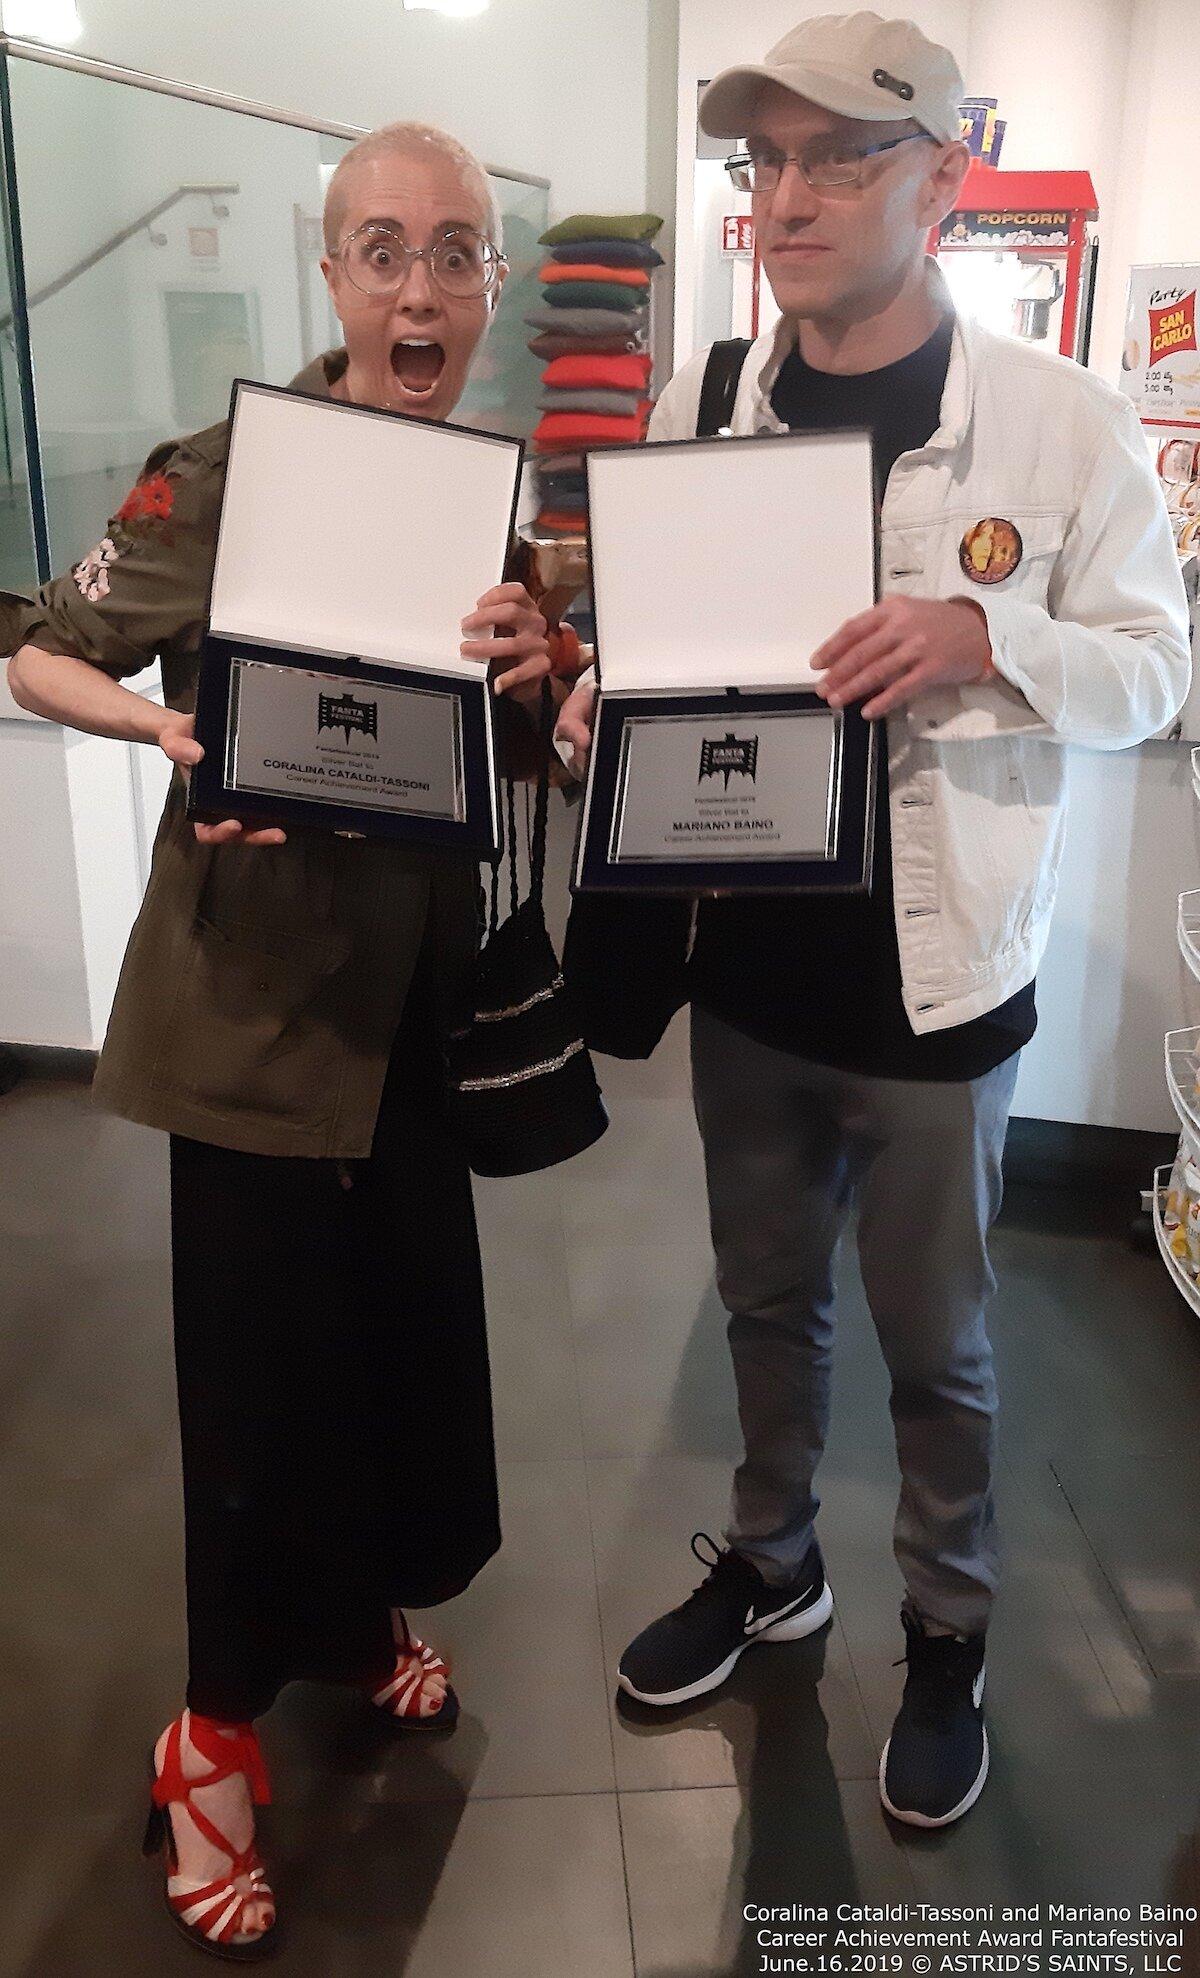 Coralina Cataldi-Tassoni and Mariano Baino Career Achievement Award Fantafestival June.16.2019 © ASTRID'S SAINTS, LLC.jpg